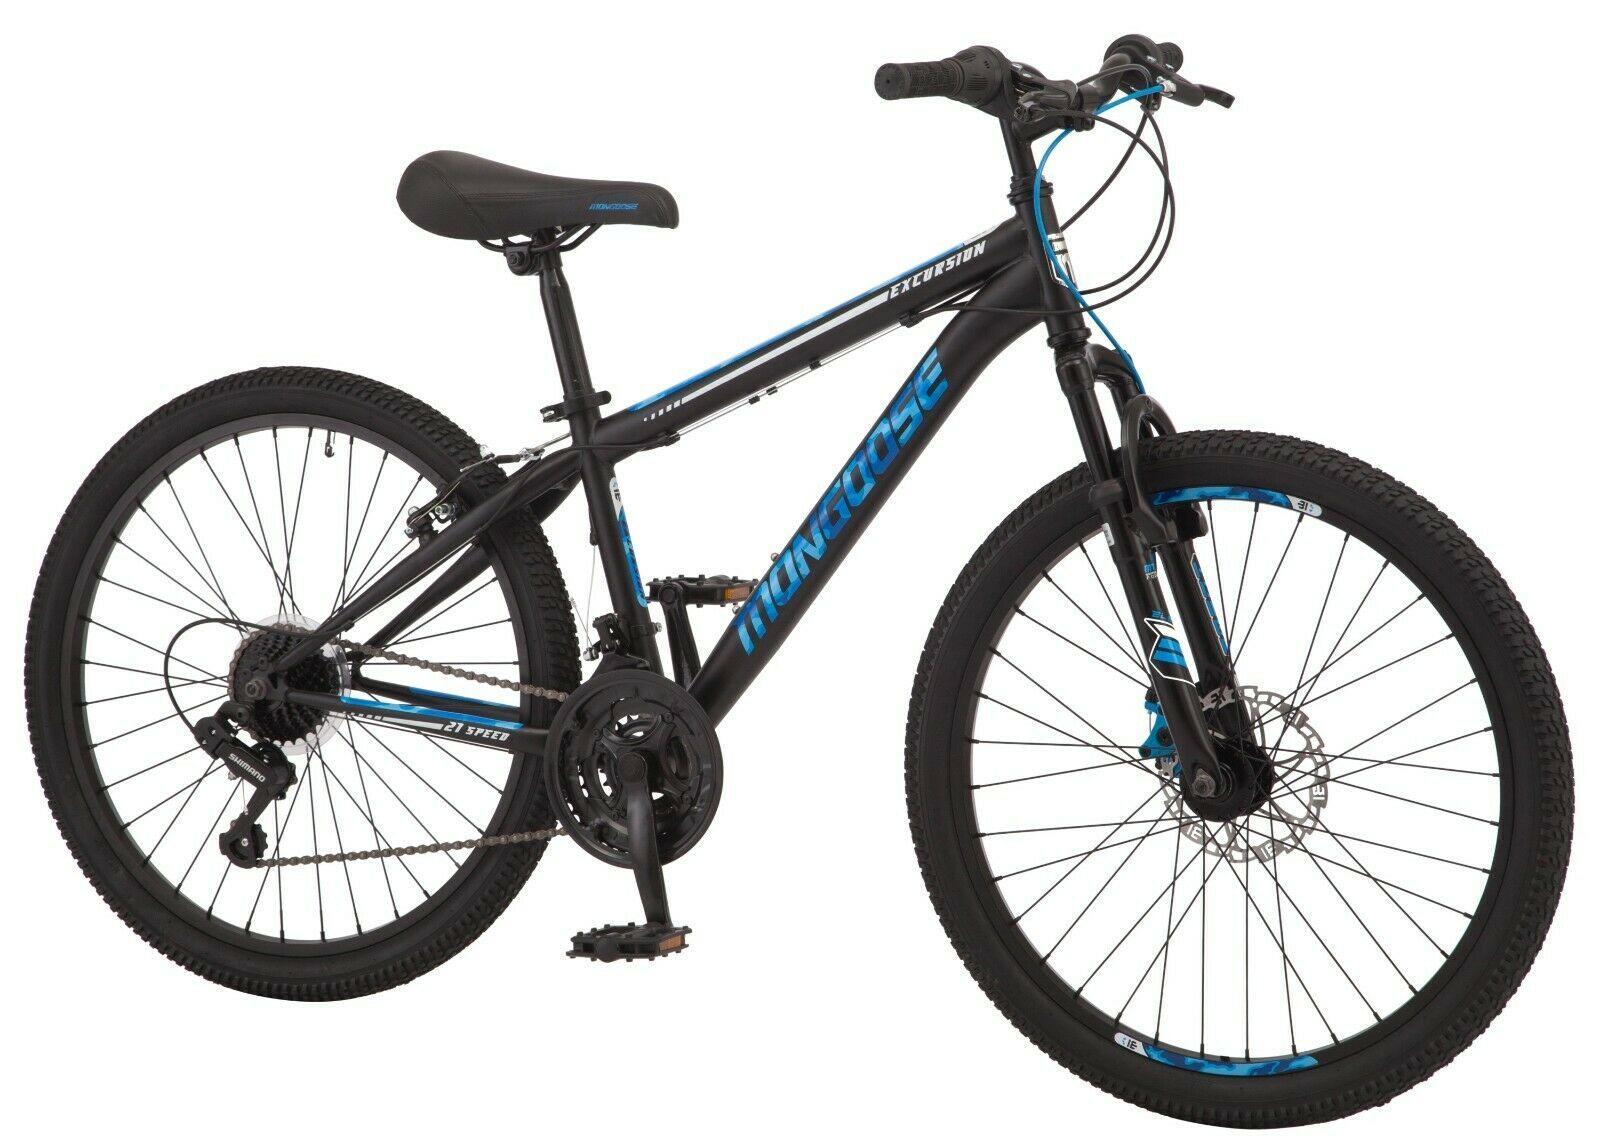 "24"" Boy's Excursion Mountain Bike w/Front Suspension & Disc Brakes, Blue Accents - $242.45"